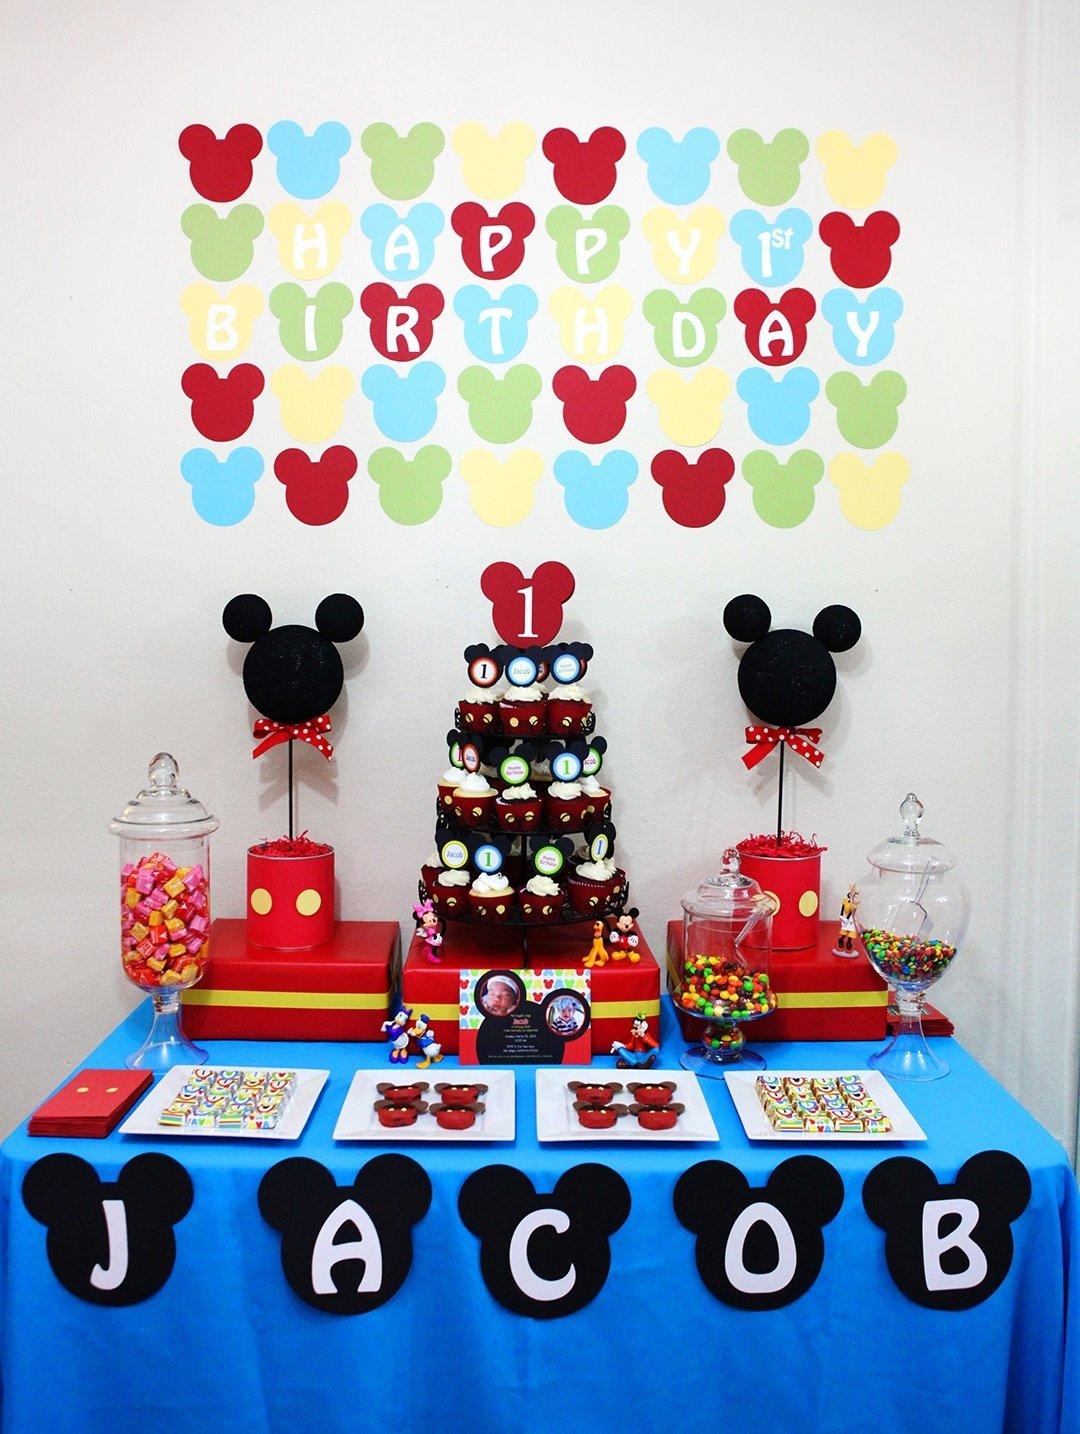 10 Gorgeous Mickey Mouse Birthday Party Ideas 1St Birthday awesome mickey mouse 1st birthday party ideas margusriga baby party 2020